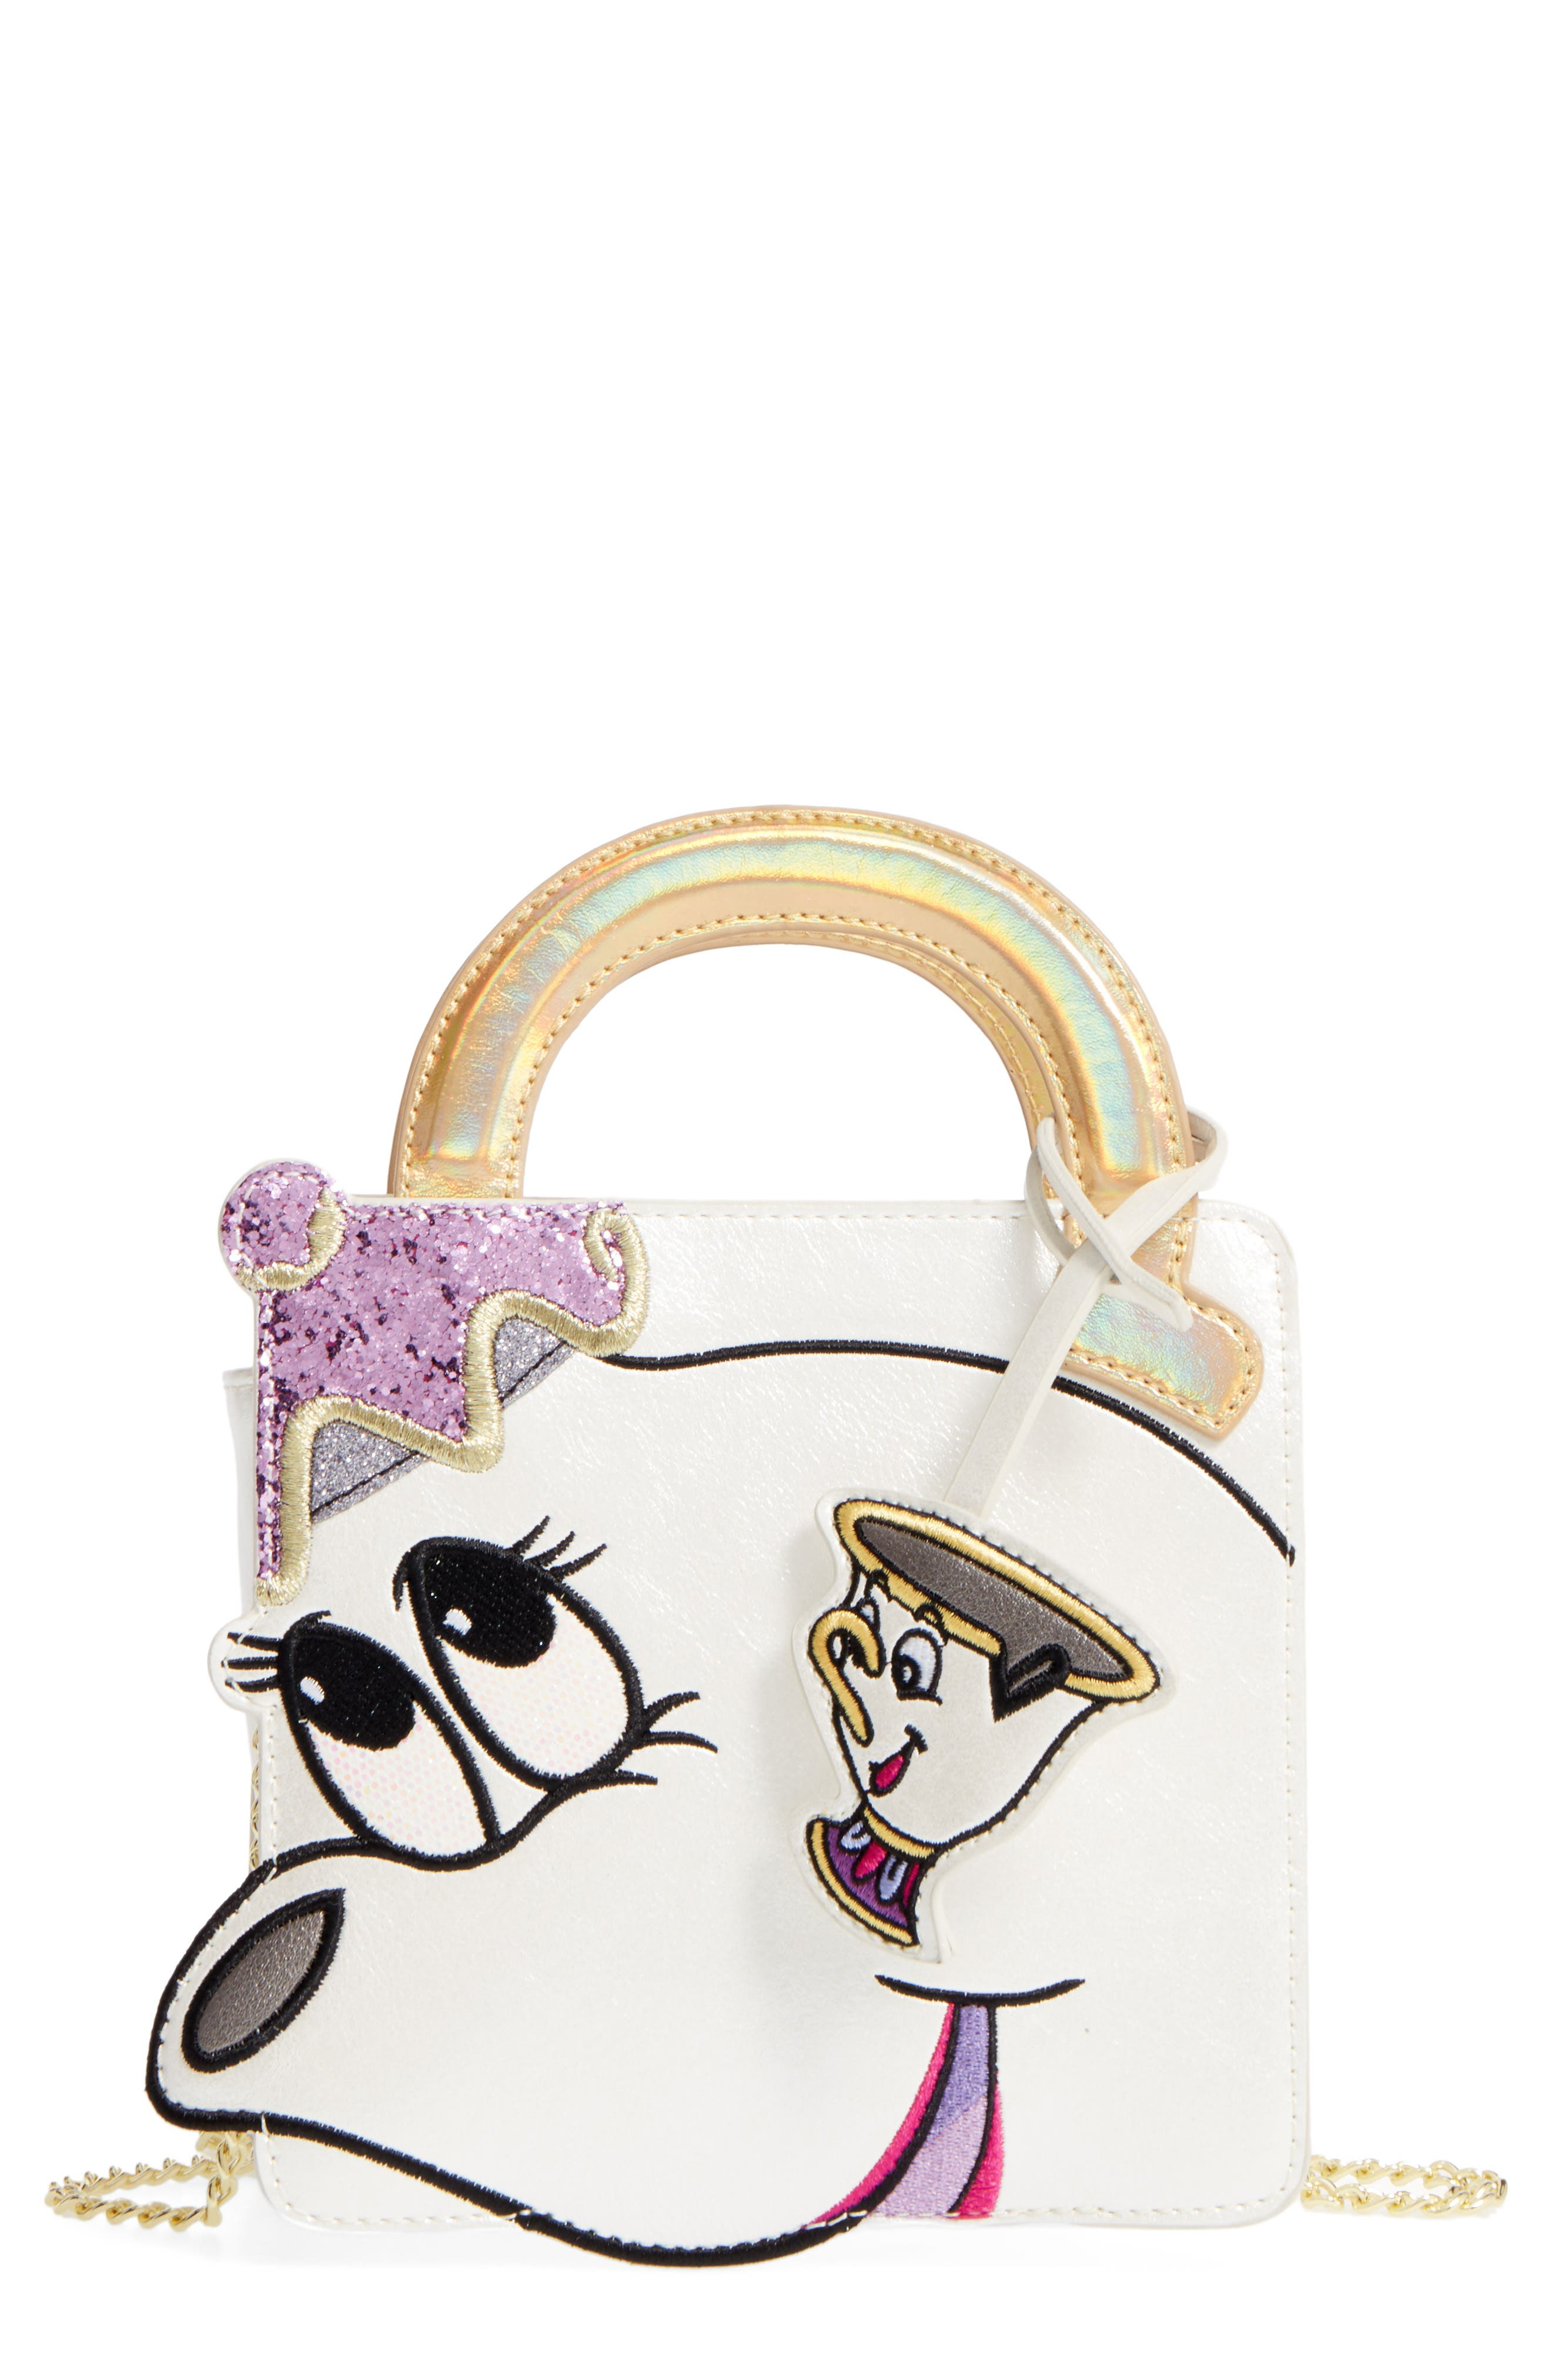 DANIELLE NICOLE x Disney<sup>®</sup> Mrs. Potts & Chip Faux Leather Crossbody Bag, Main, color, 040